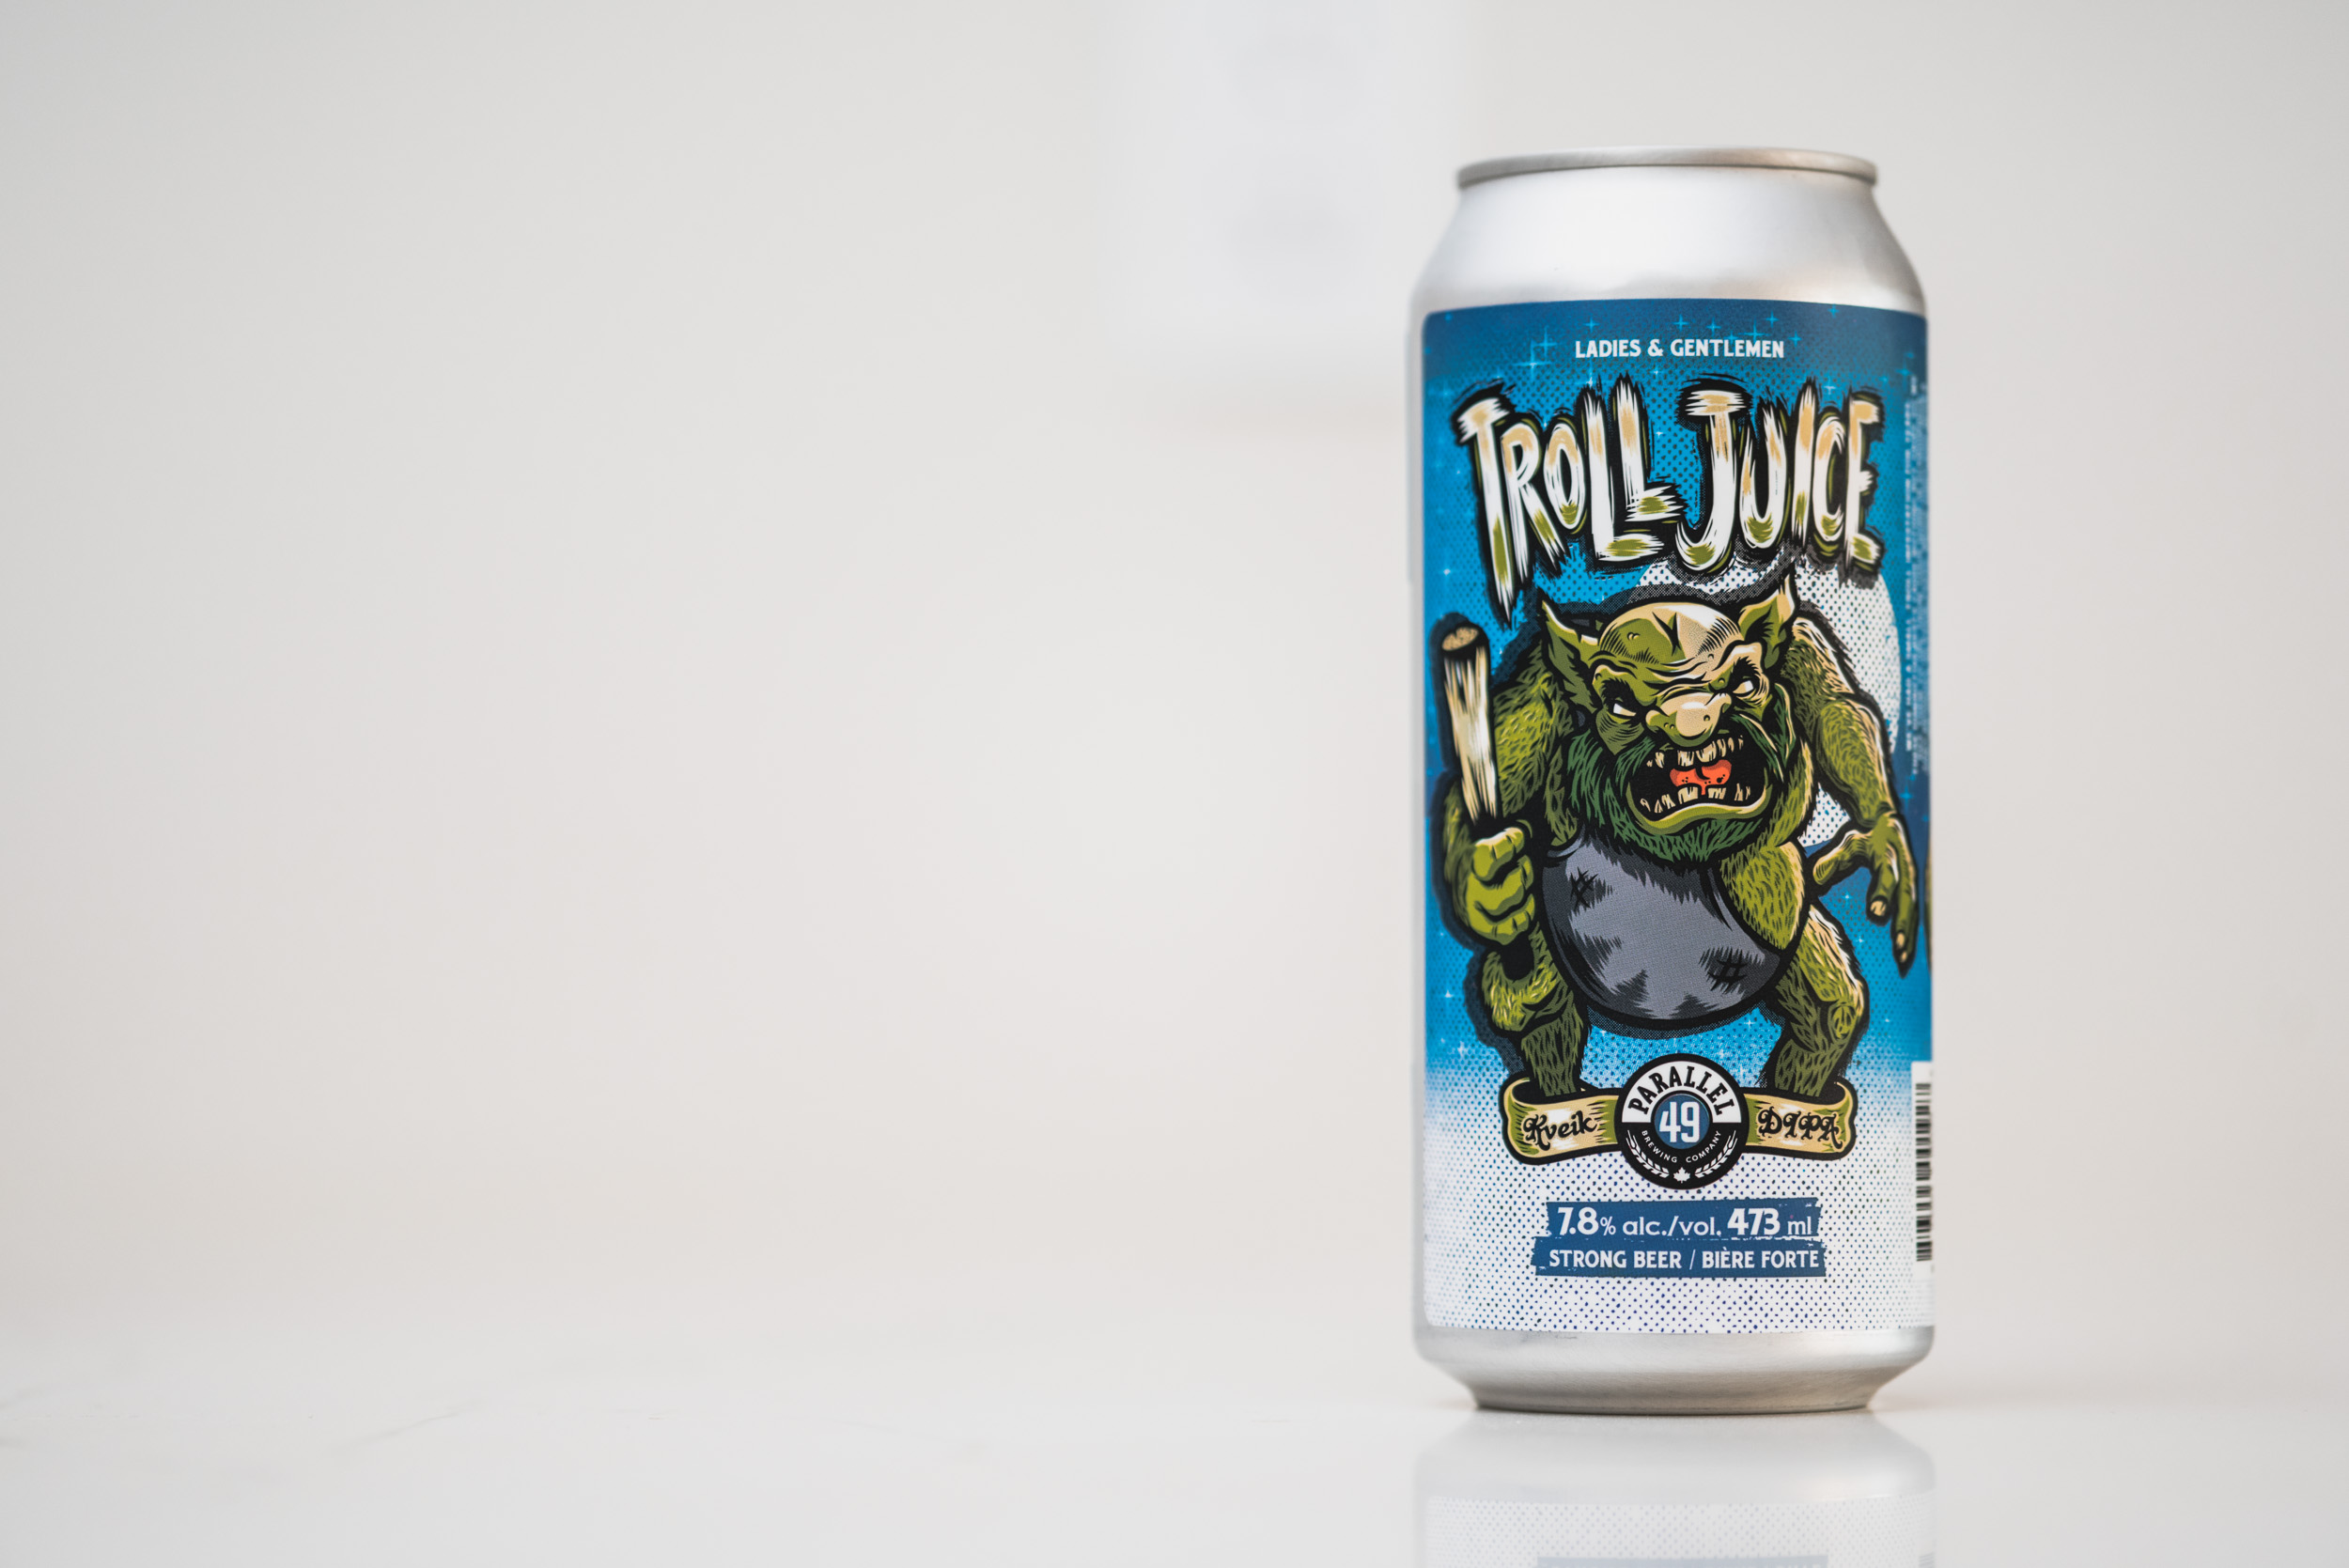 Parallel 49 Troll Juice Kveik Double IPA